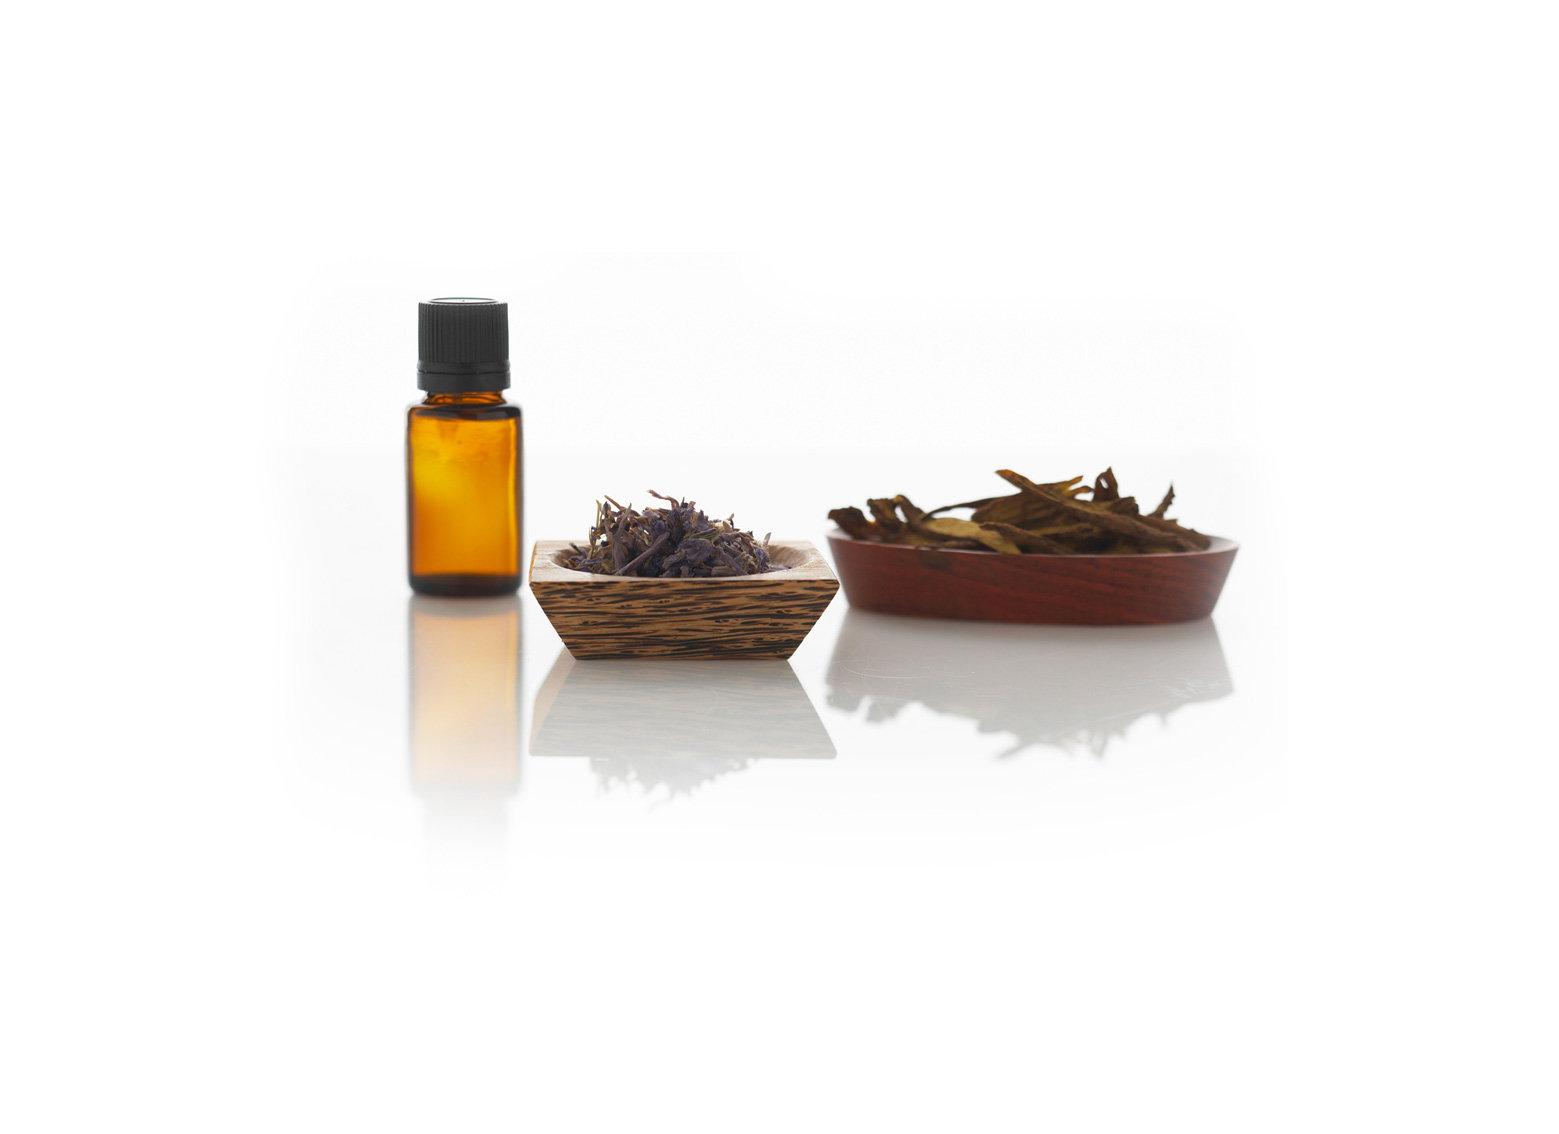 Bespoke Oil Remedies